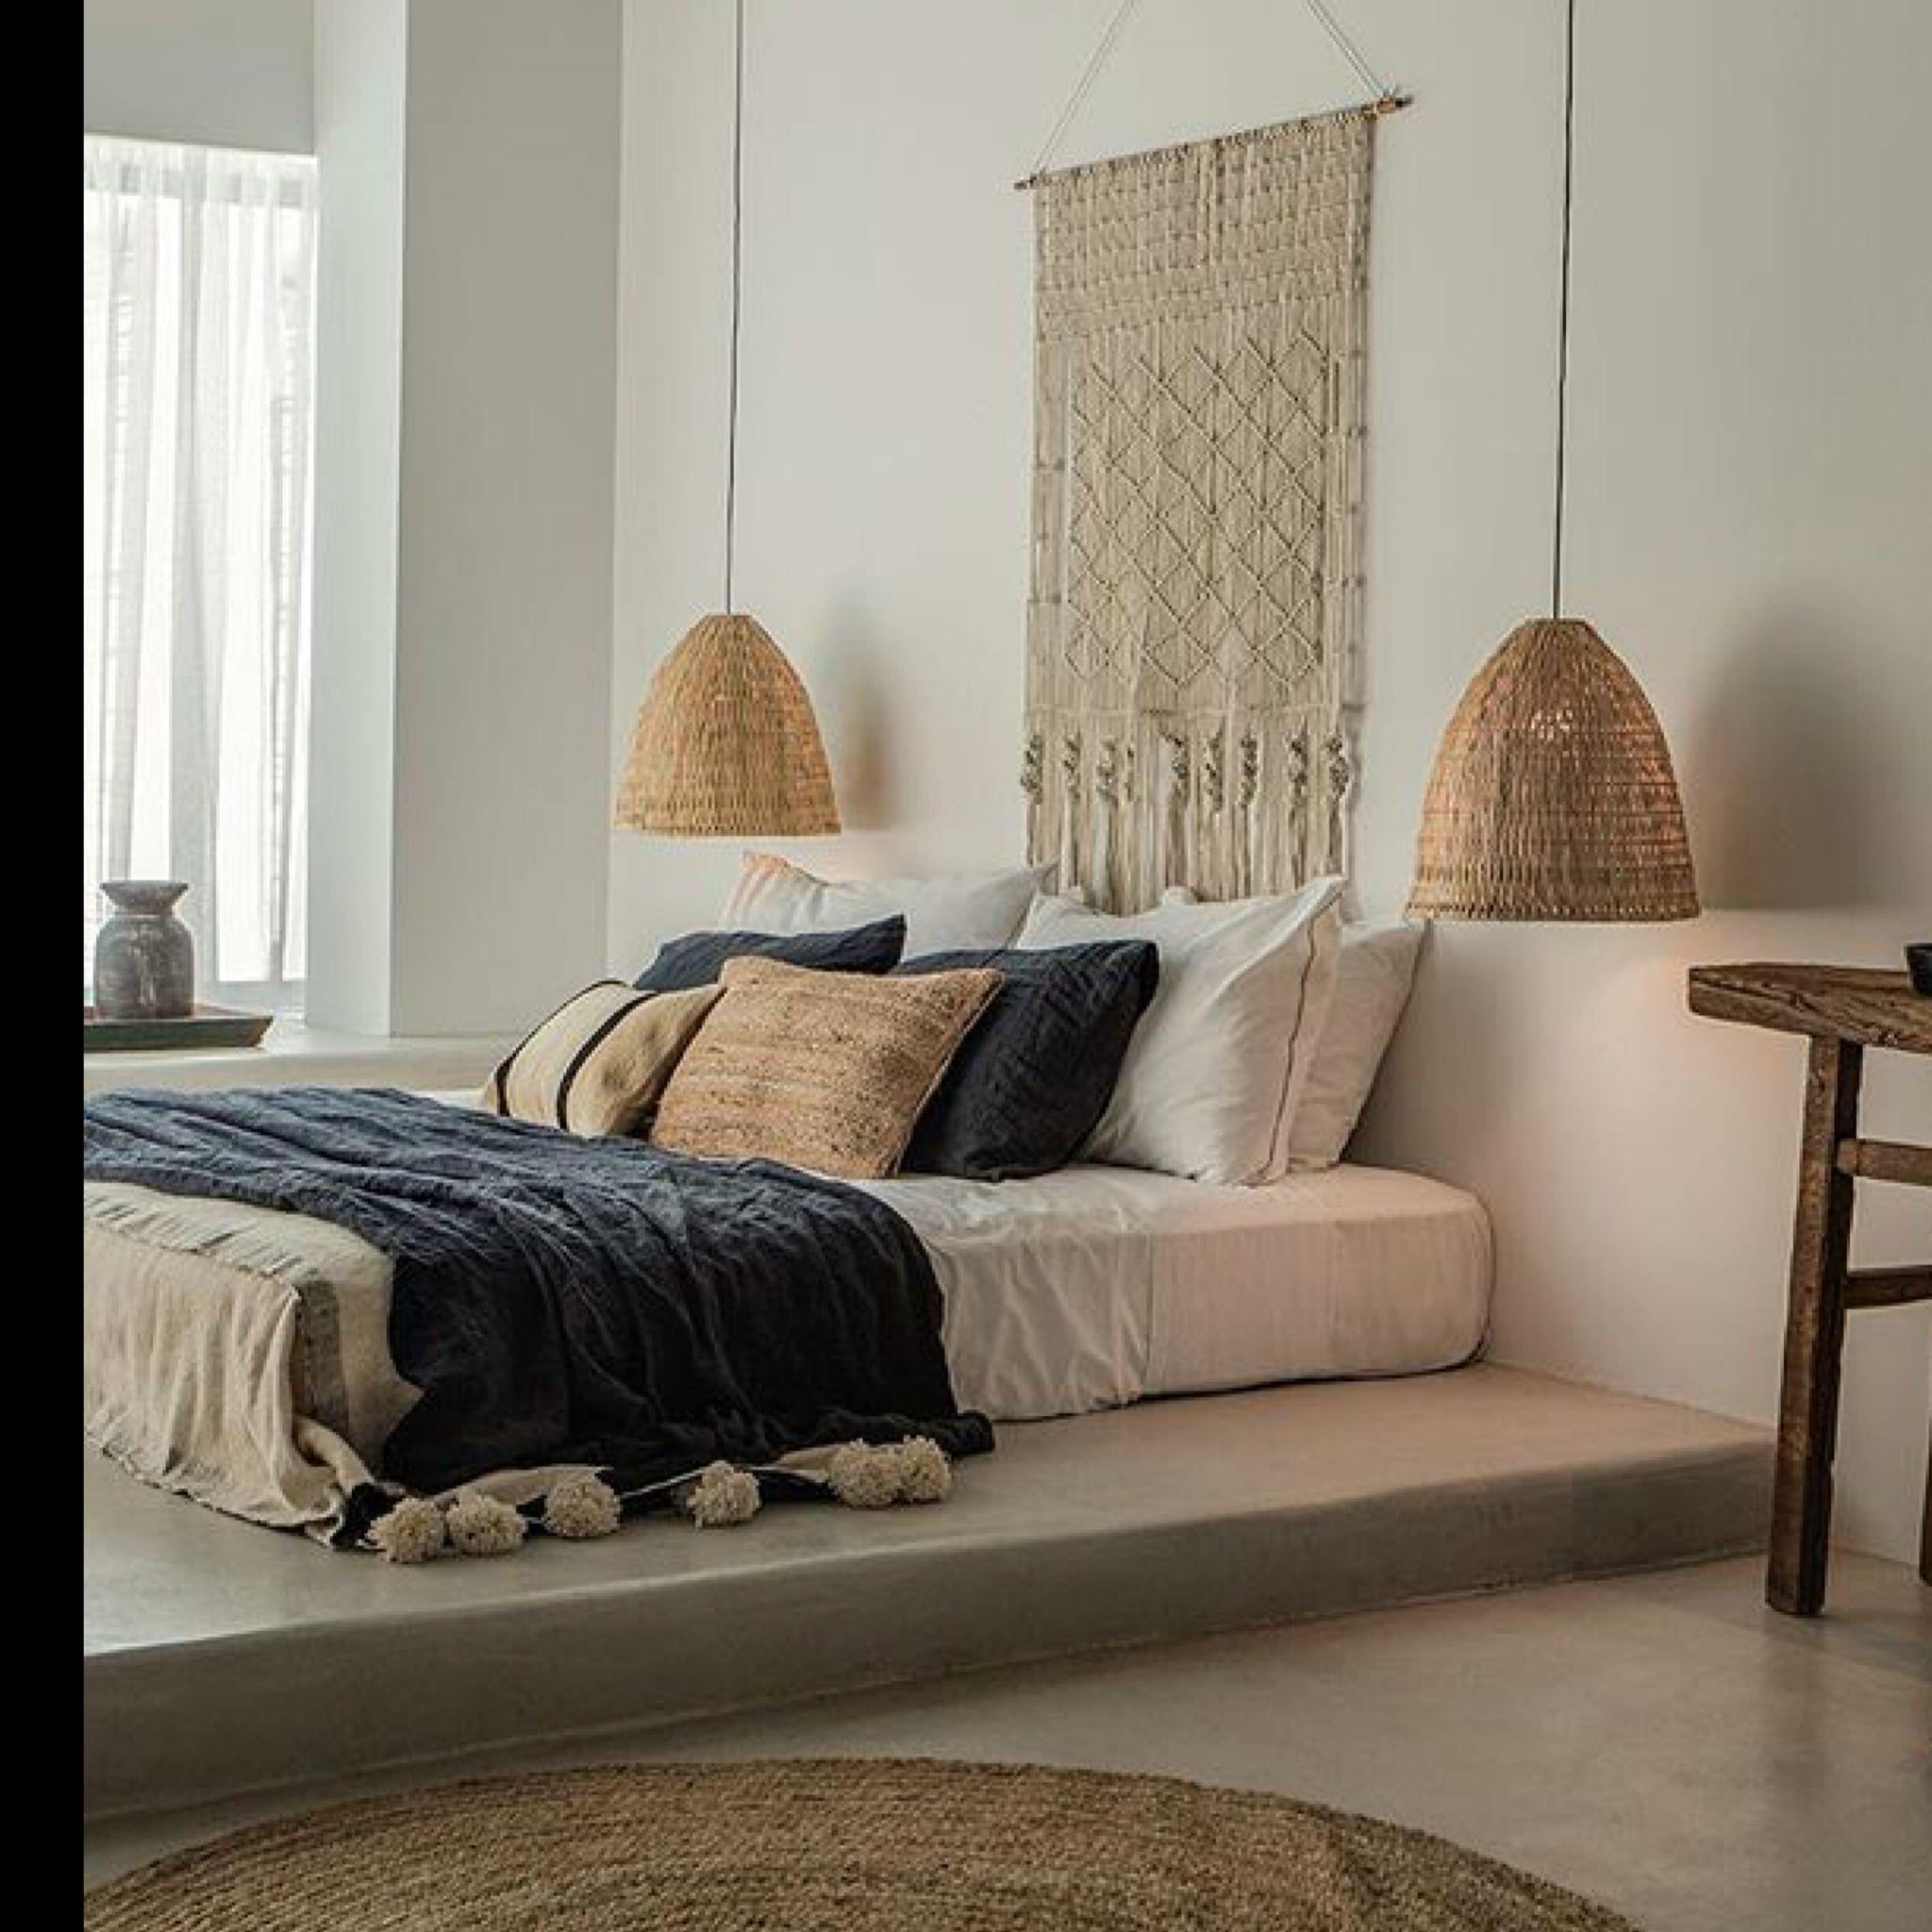 Bedroom Design Inspiration Bycocoon.com